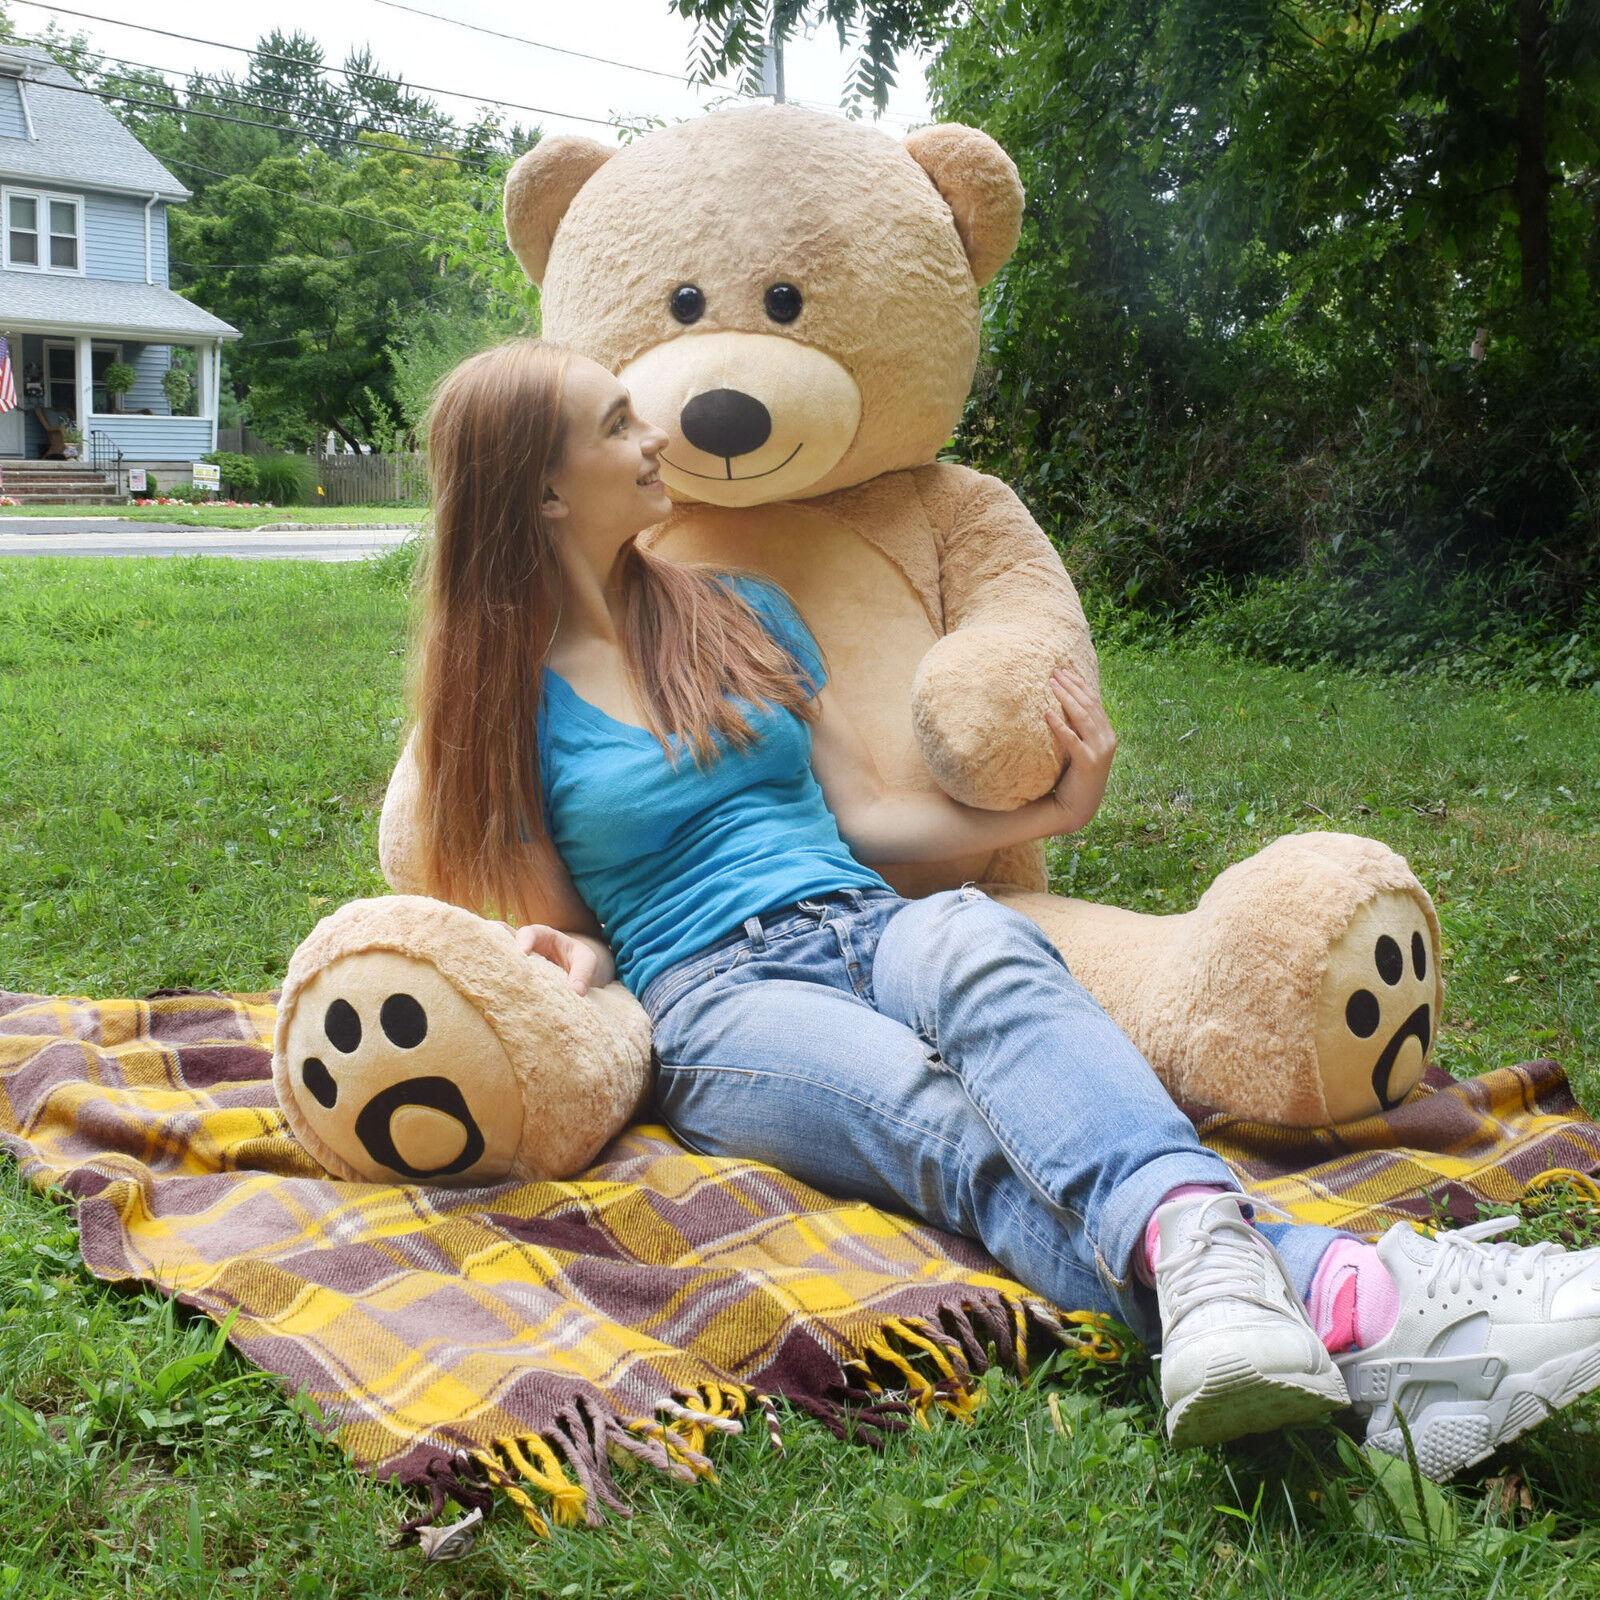 "Giant Teddy Bear Lifesize Soft Stuffed Plush Animal Toy 36"" Valentine Girl Gift"